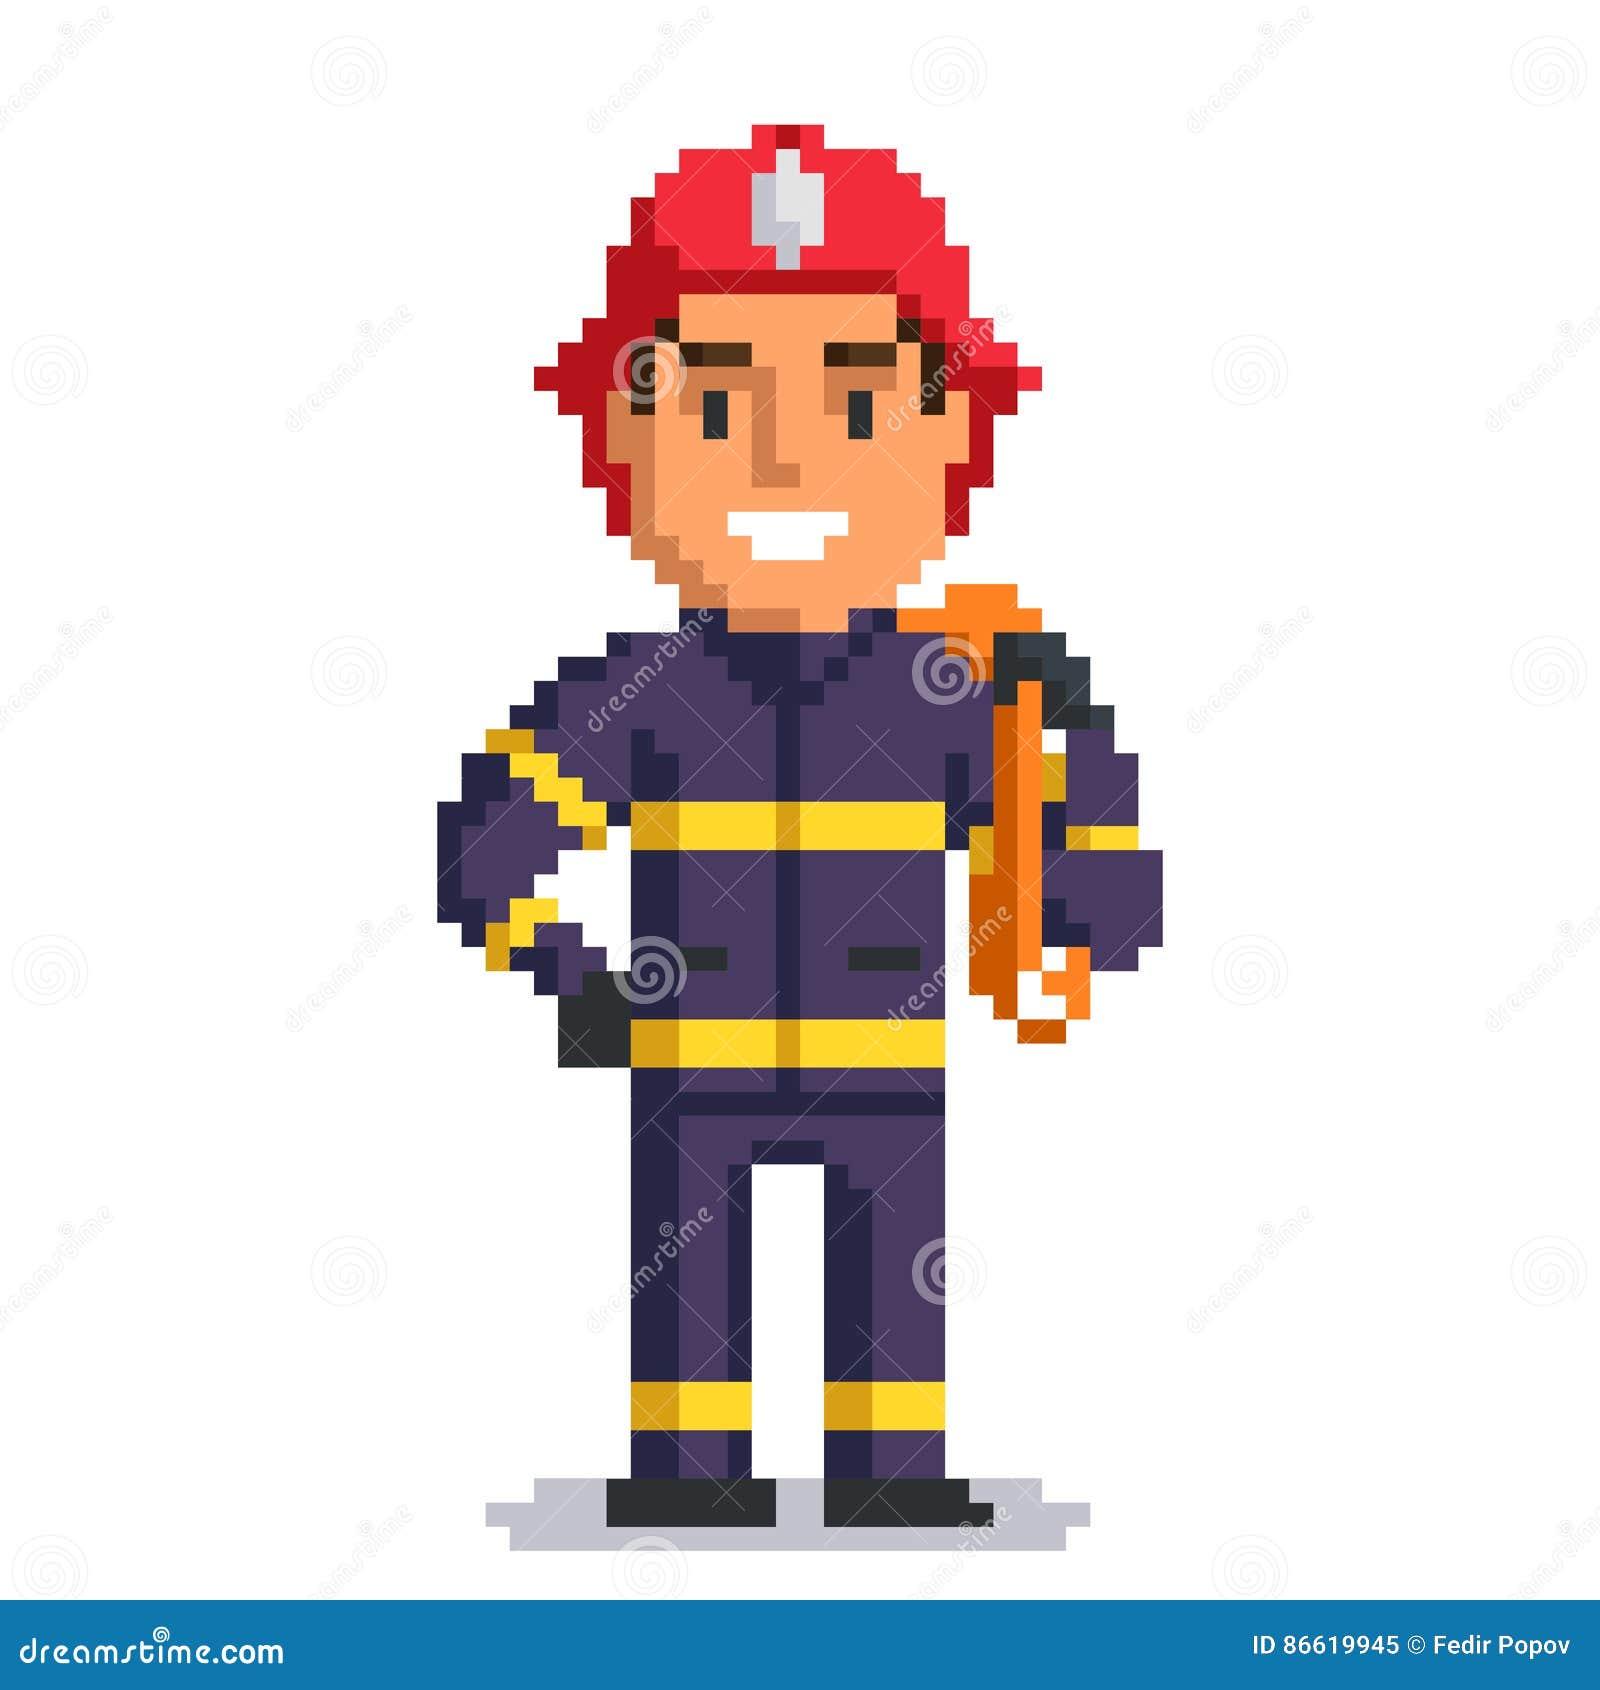 Firefighter Pixel Art Illustration 86619945 Megapixl